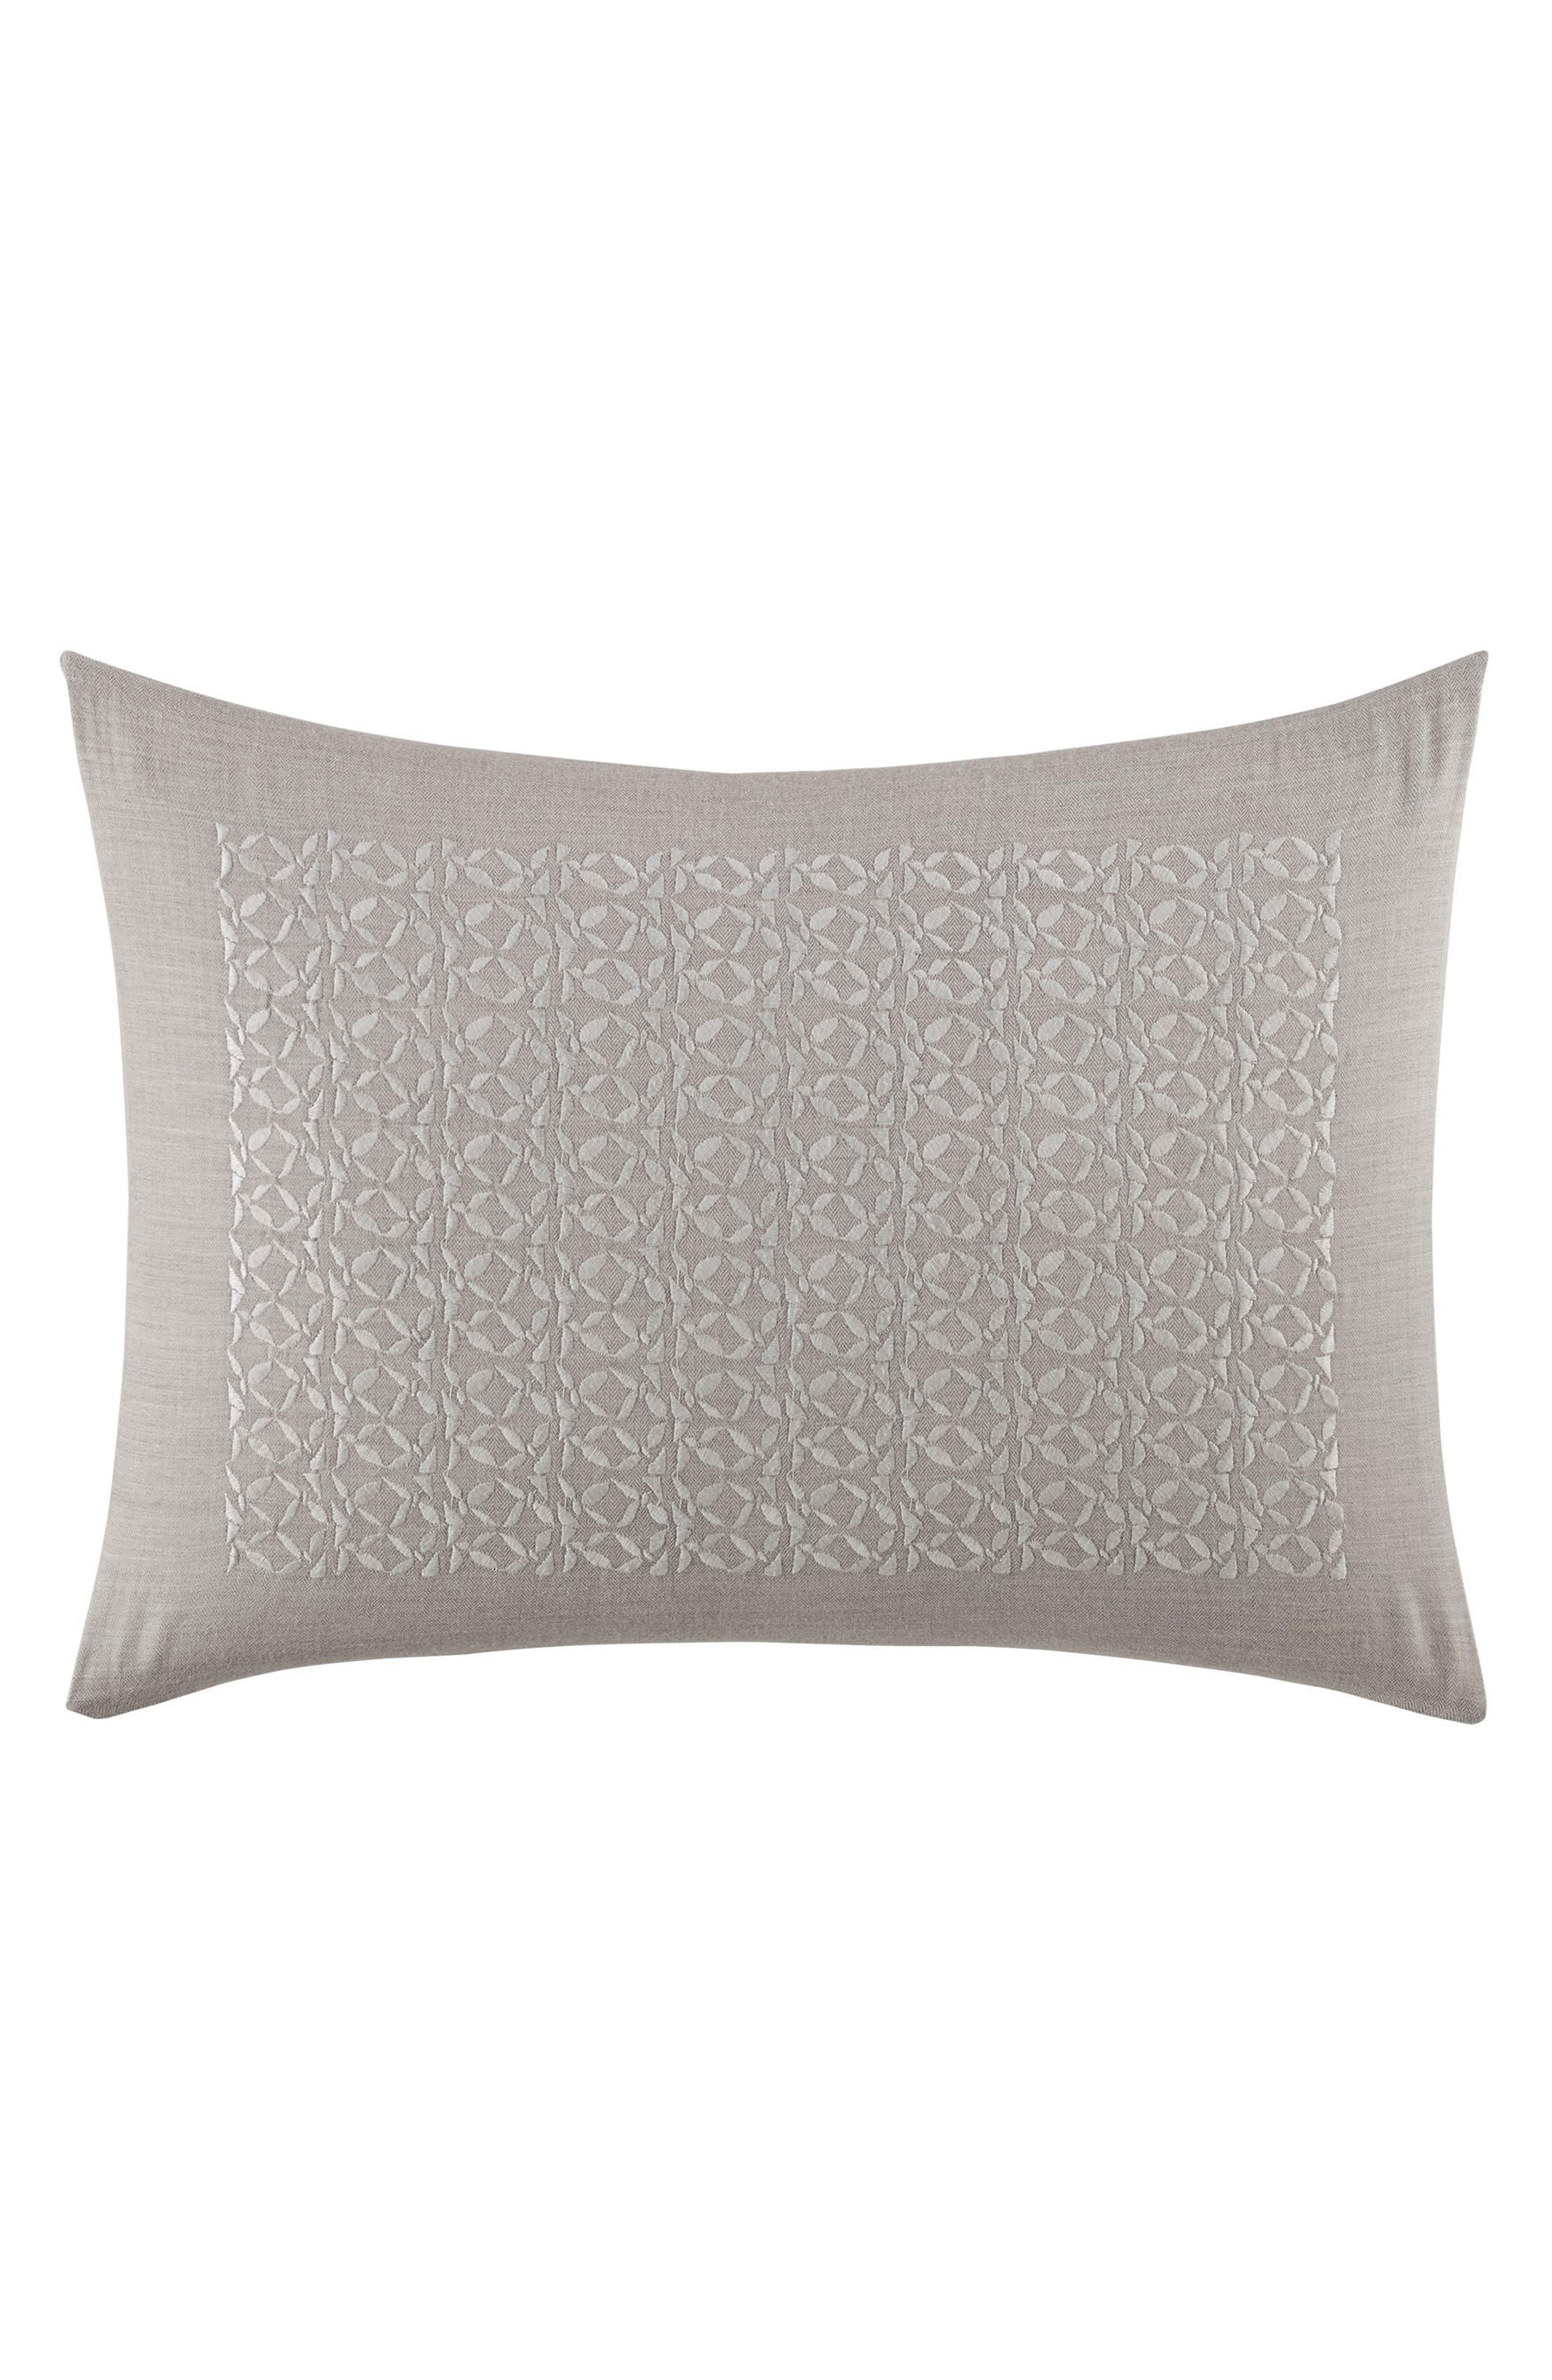 Veiled Bouquet Breakfast Accent Pillow,                         Main,                         color, Light Grey